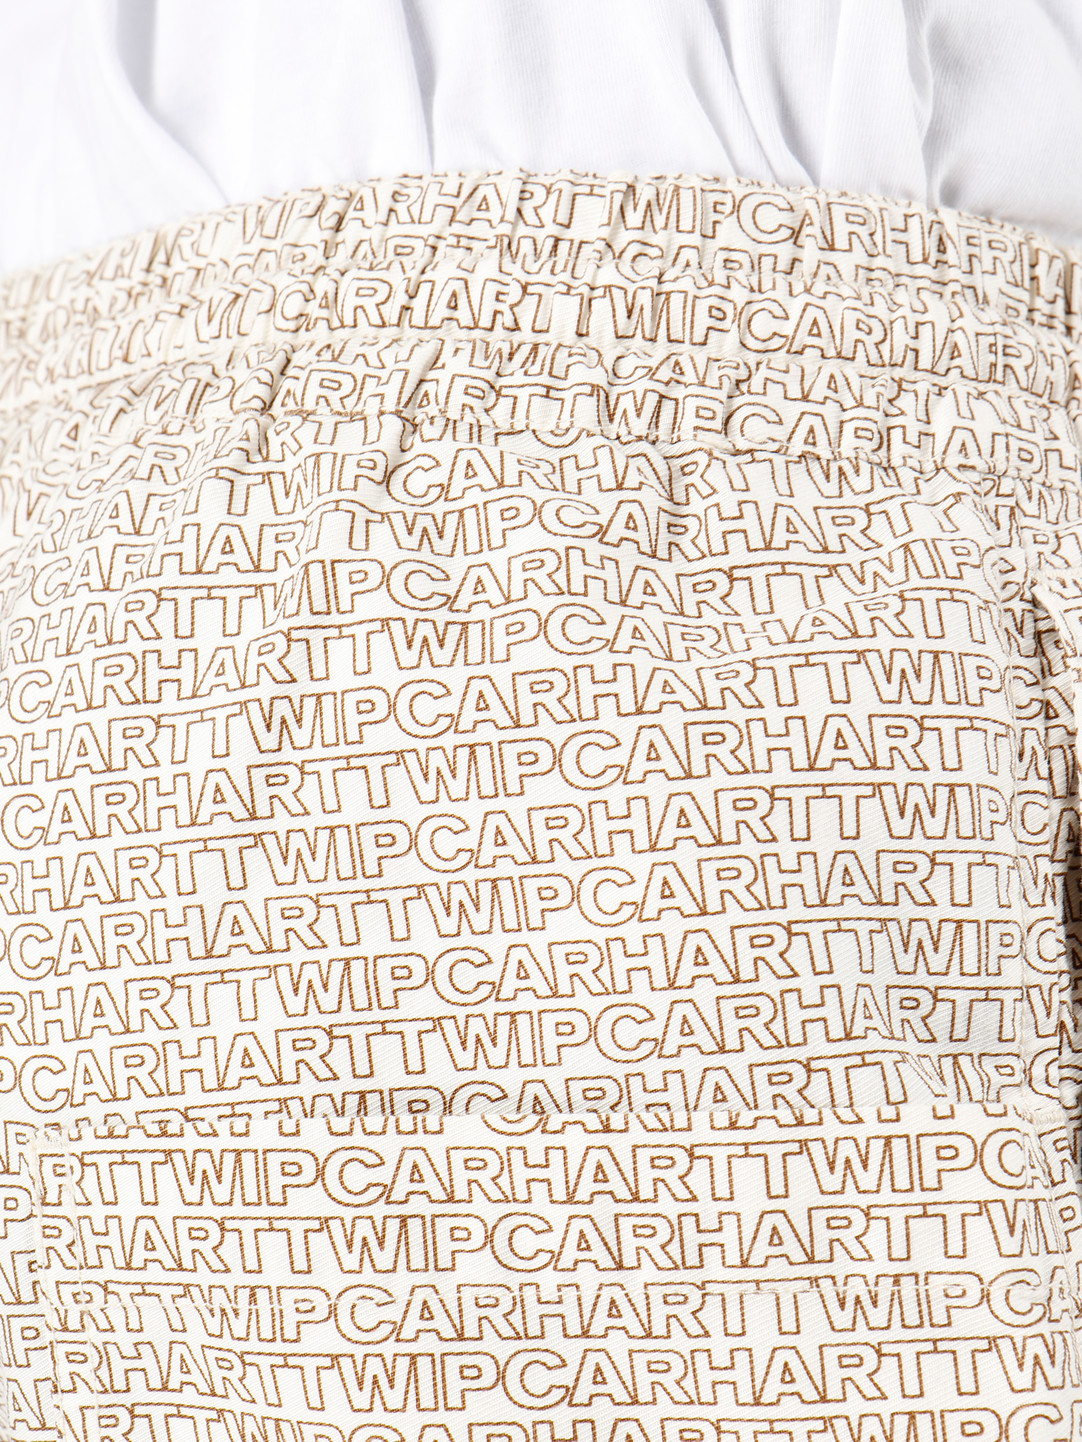 Carhartt WIP Carhartt WIP Typo Short Typo Print Wax Hamilton Brown 62034235